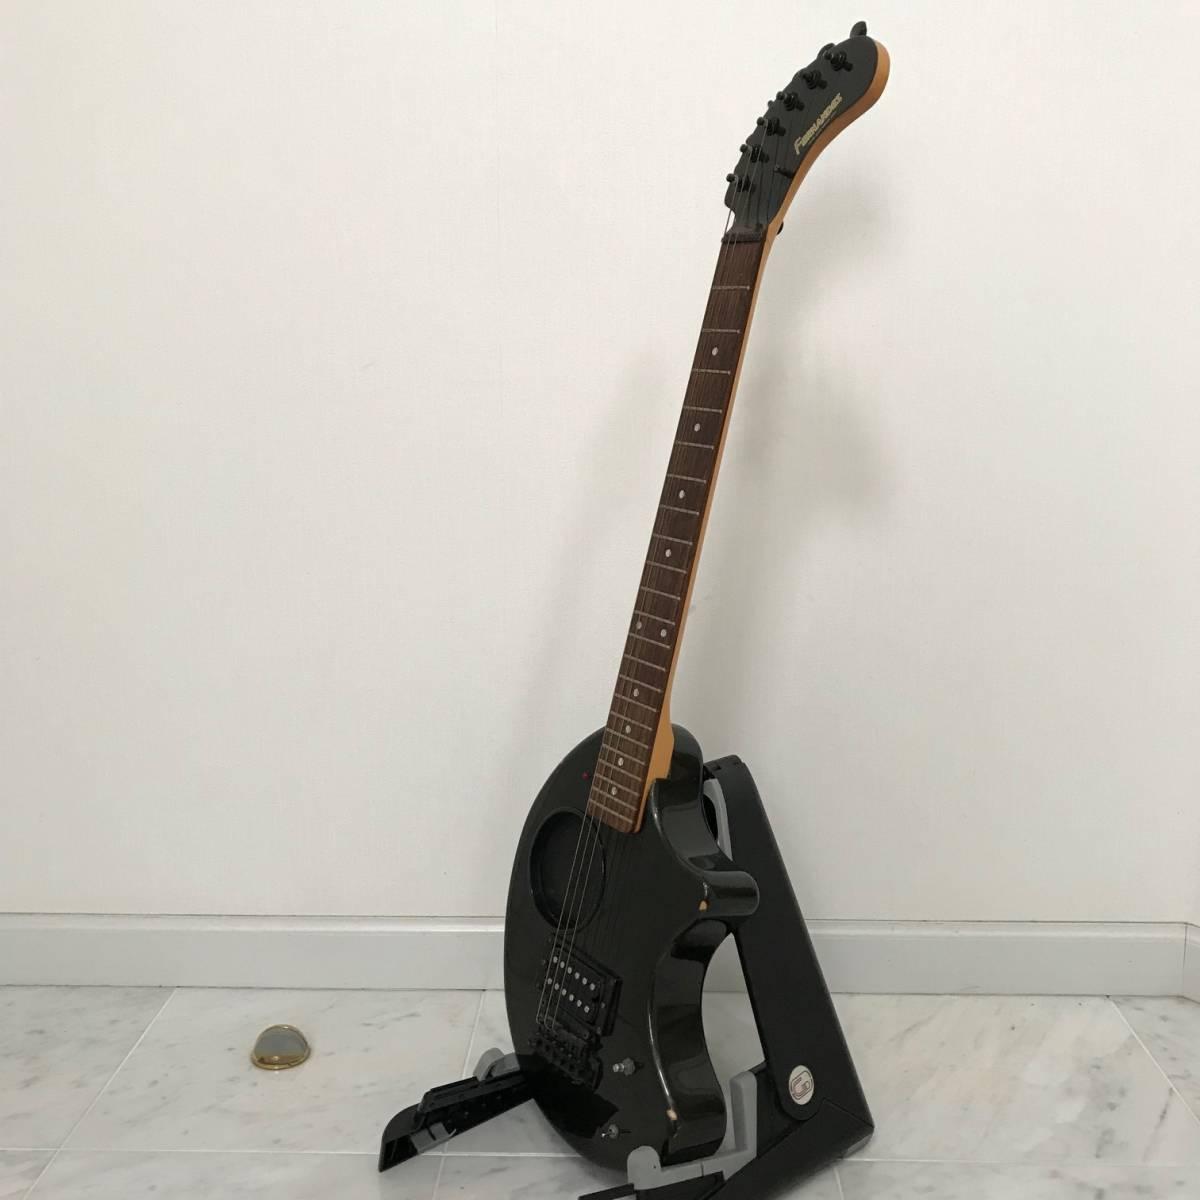 ZO-3 芸達者 ディストーション アンプ内臓 GOTOHペグ ギター ブラックメタリック ジャンク FERNANDES_画像5